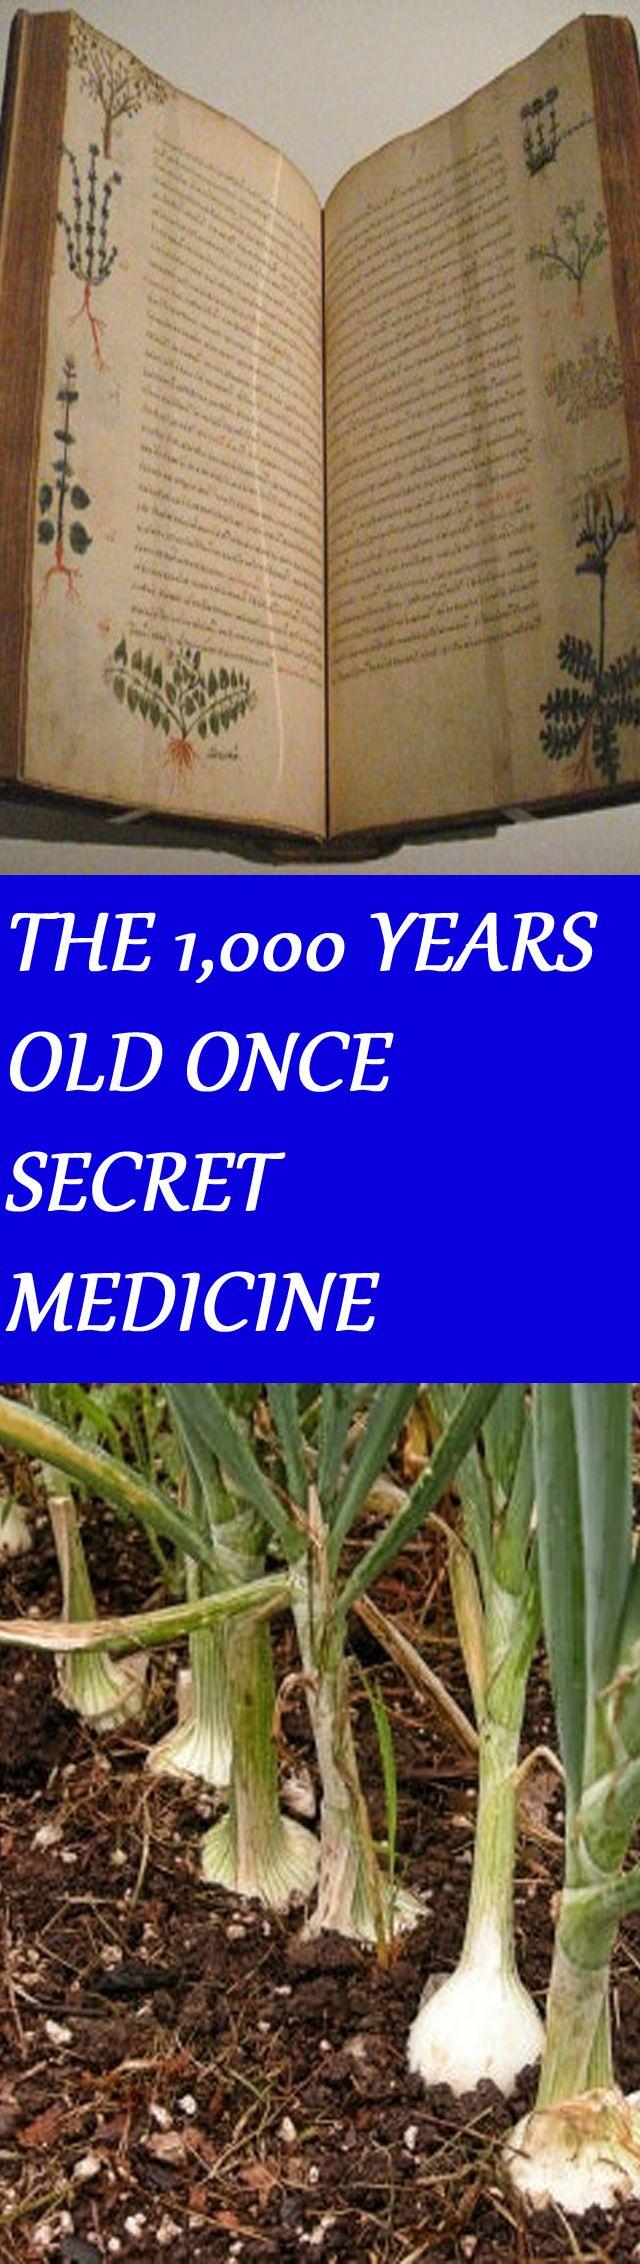 THE 1,000-YEAR-OLD ONCE-SECRET MEDICINE THAT KILLS SUPERBUGS